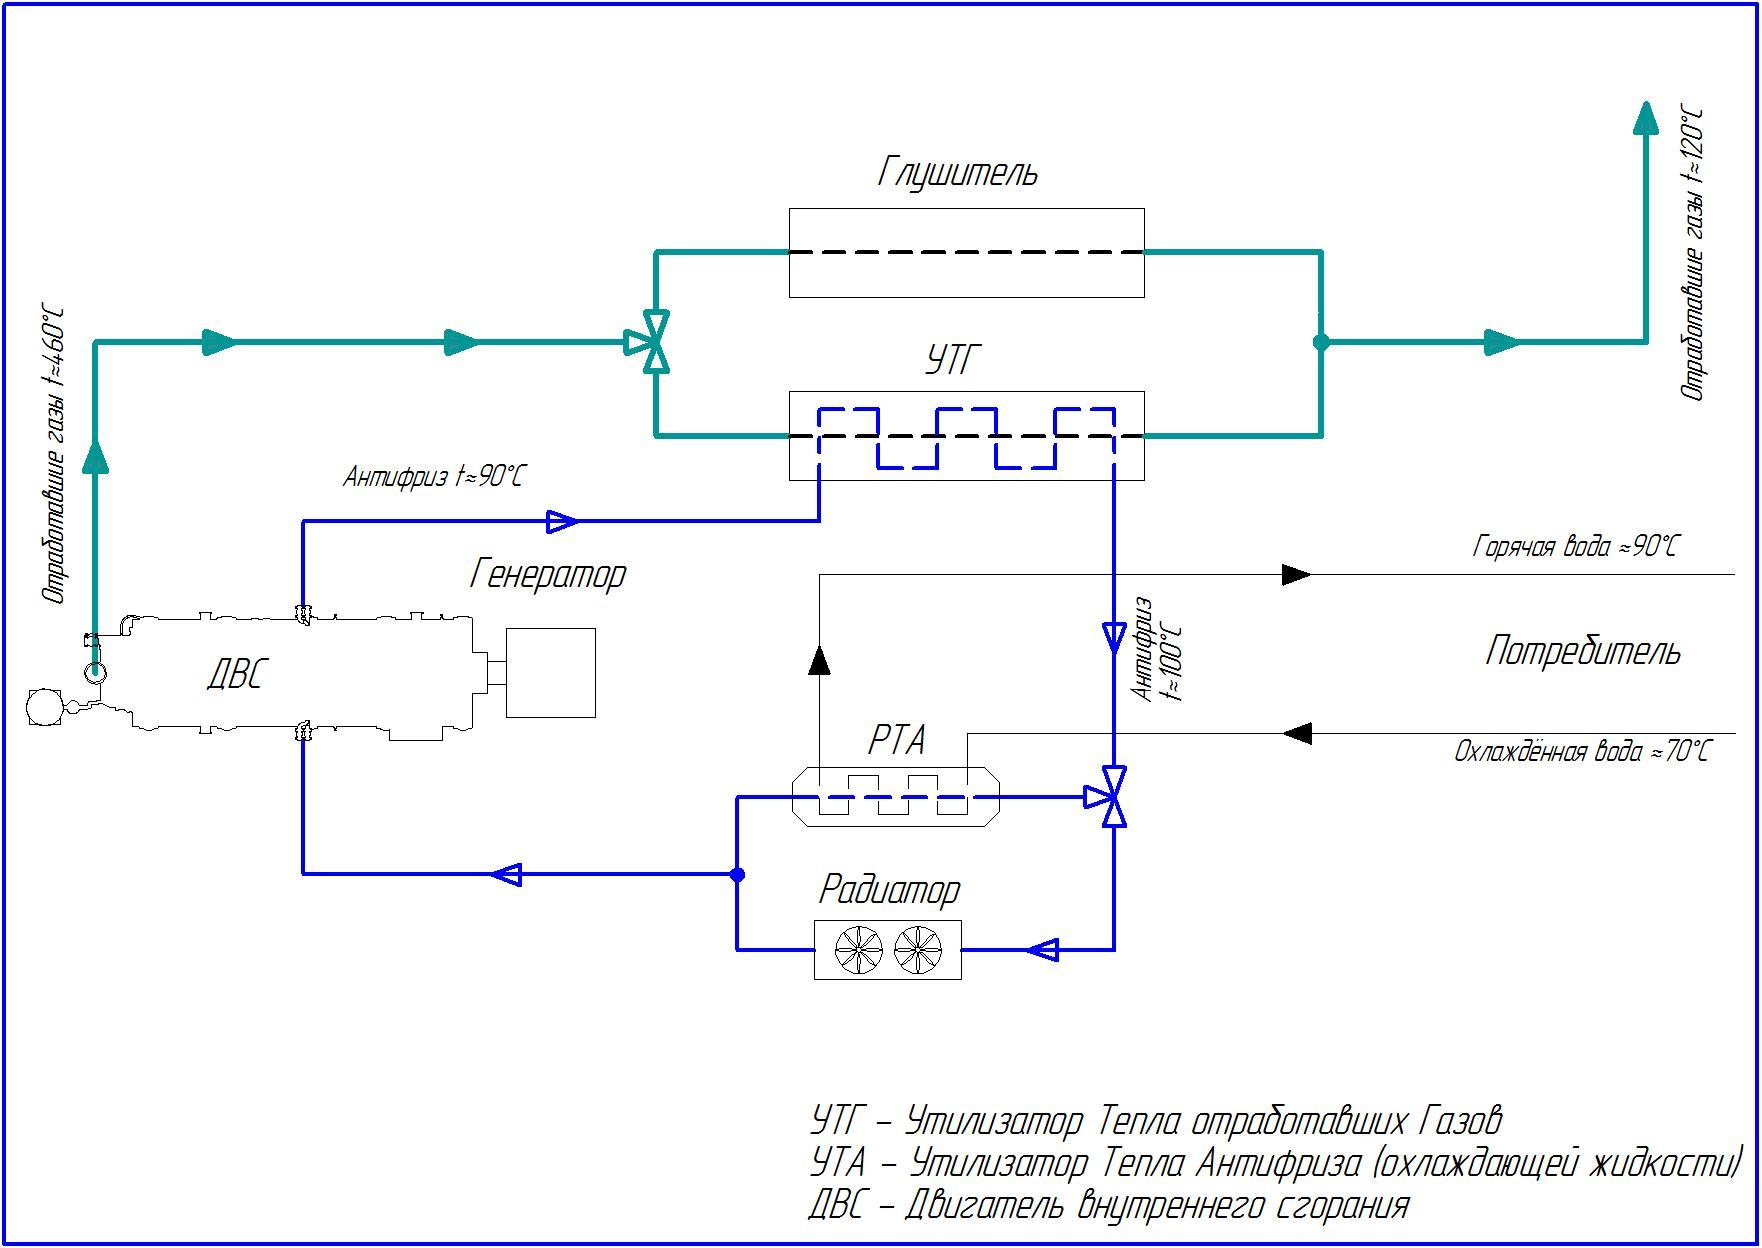 Утилизатор тепла антифриза (УТА) для ГПУ-100